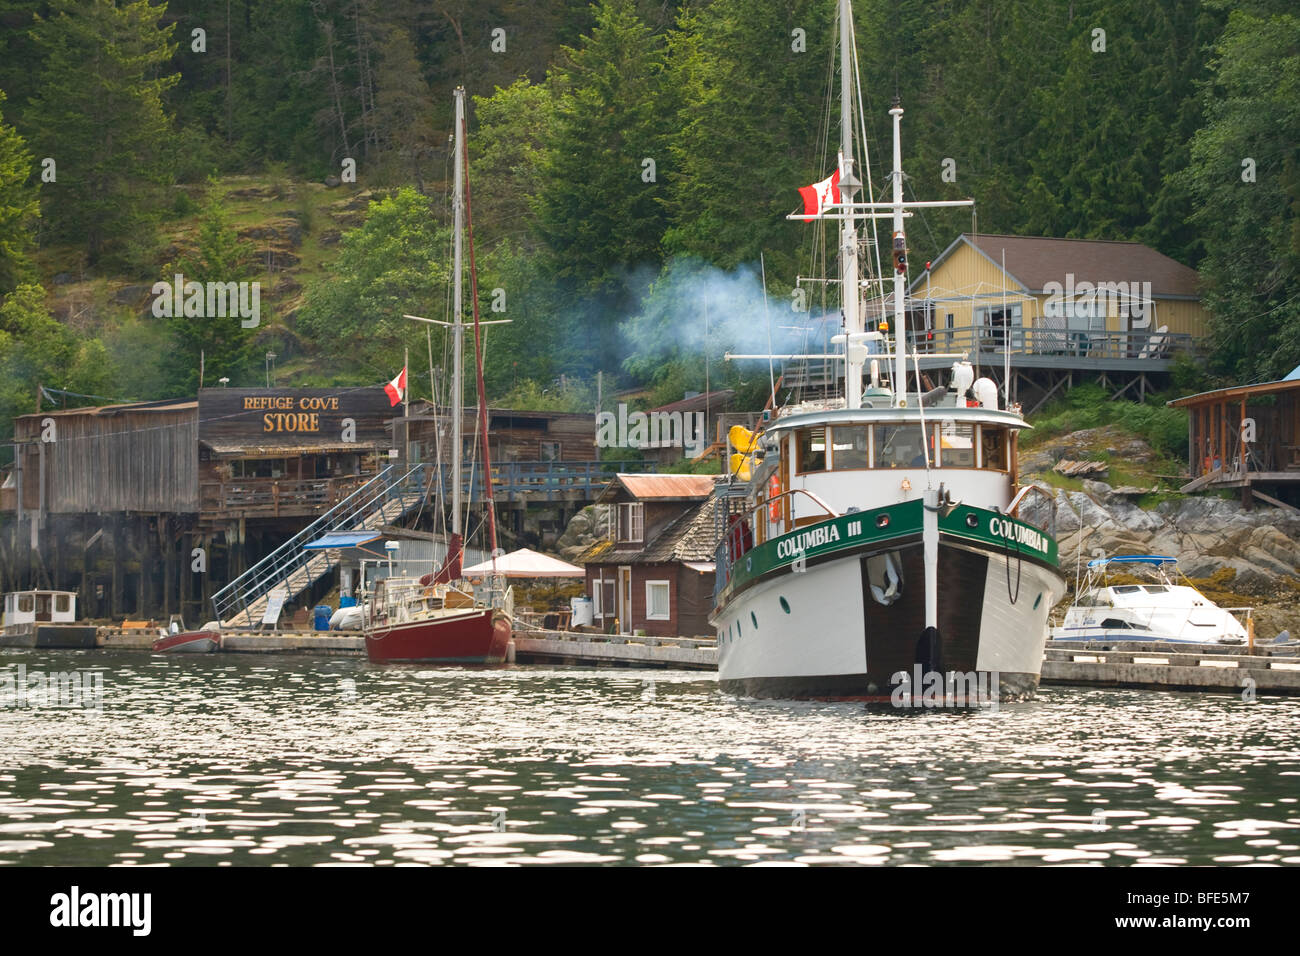 Boat, MV Columbia III,, Desolation Sound, British Columbia, Canada - Stock Image